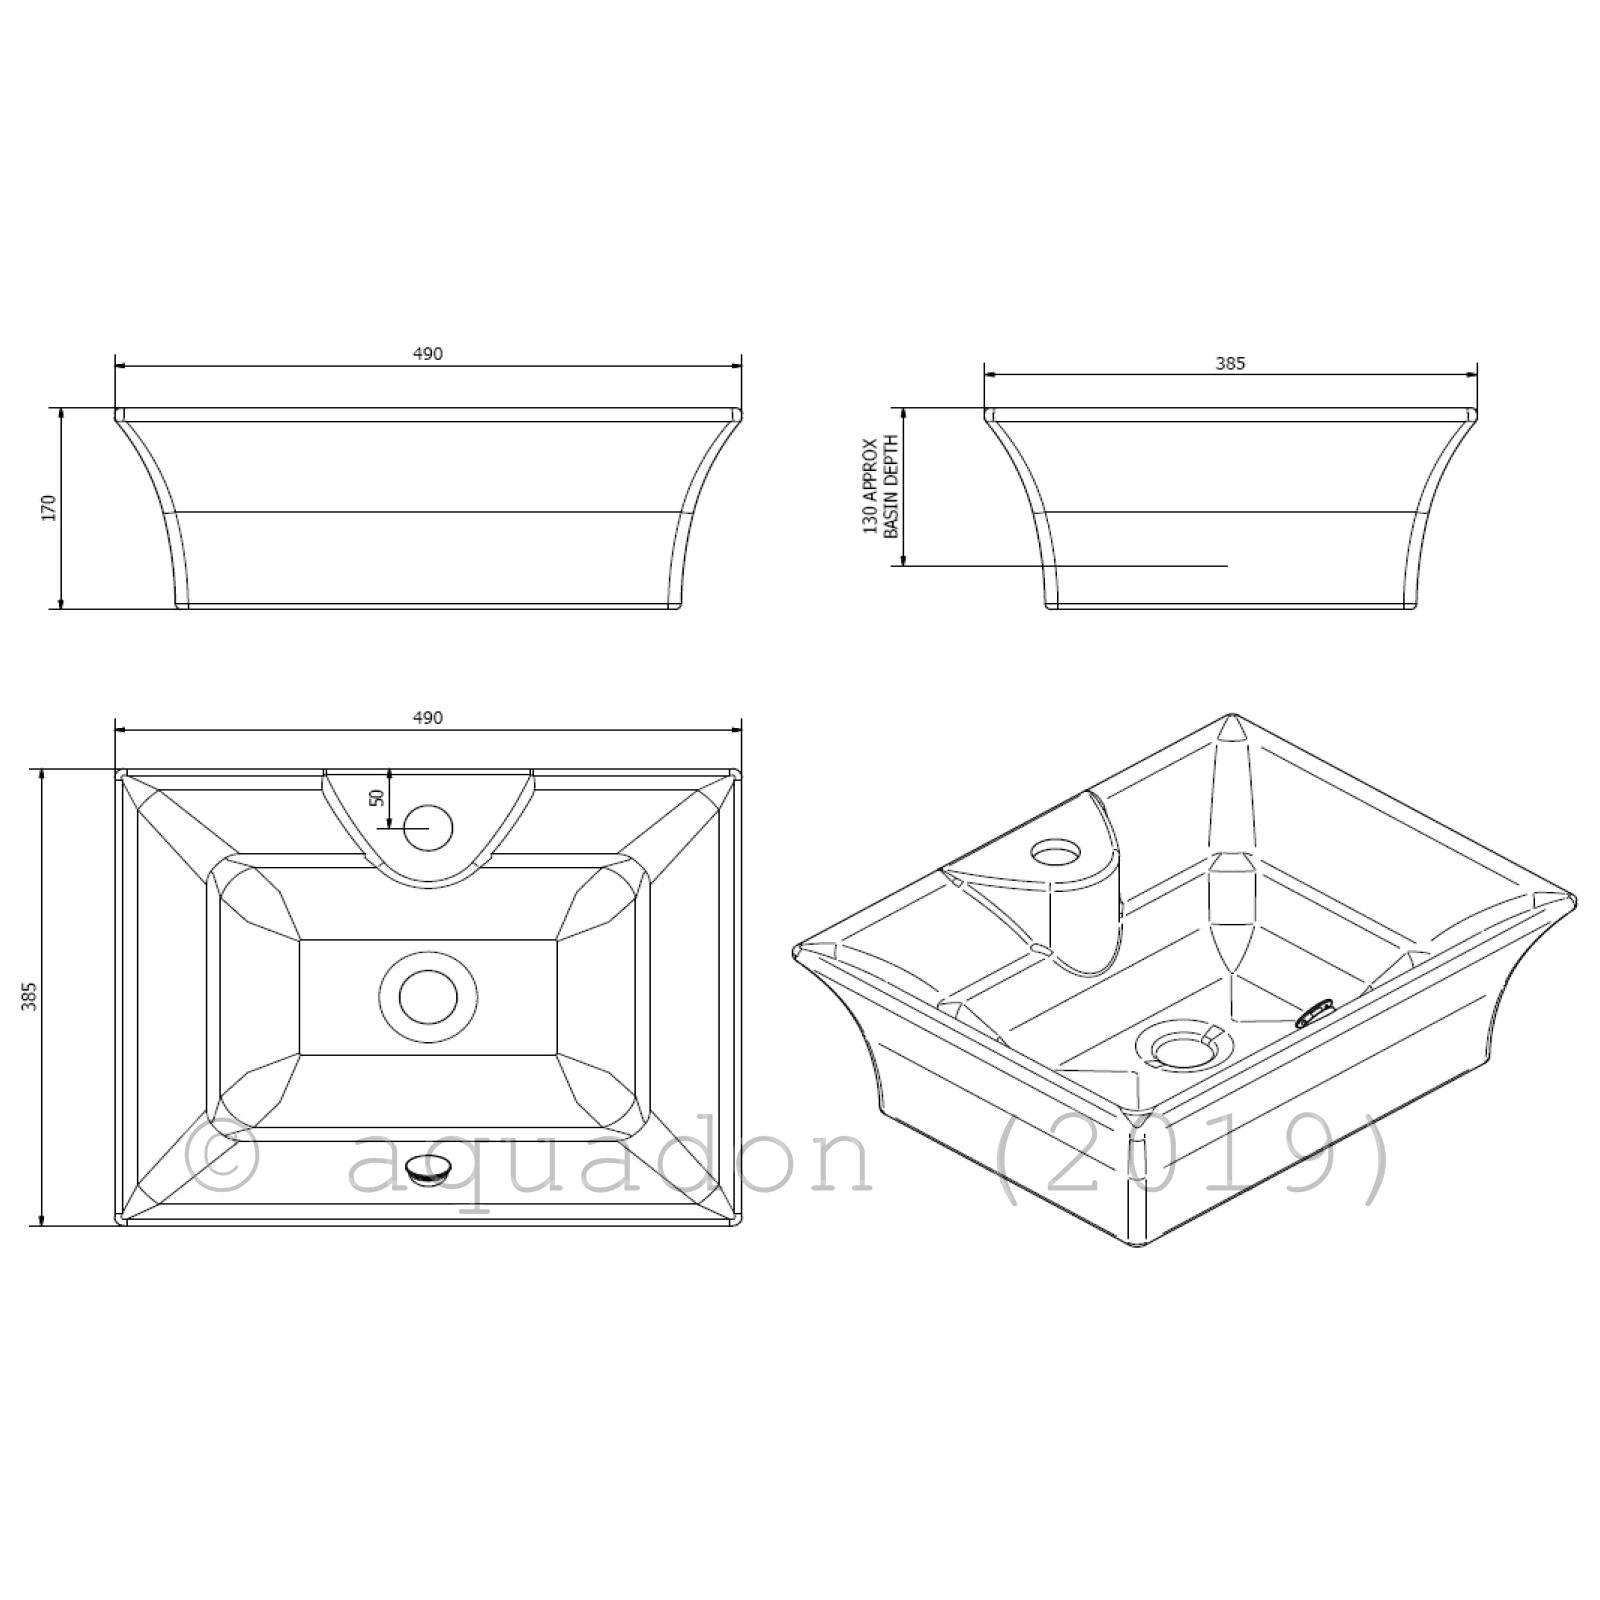 Vessel Basin Sink Floating Shelves Shelf Bathrooms White